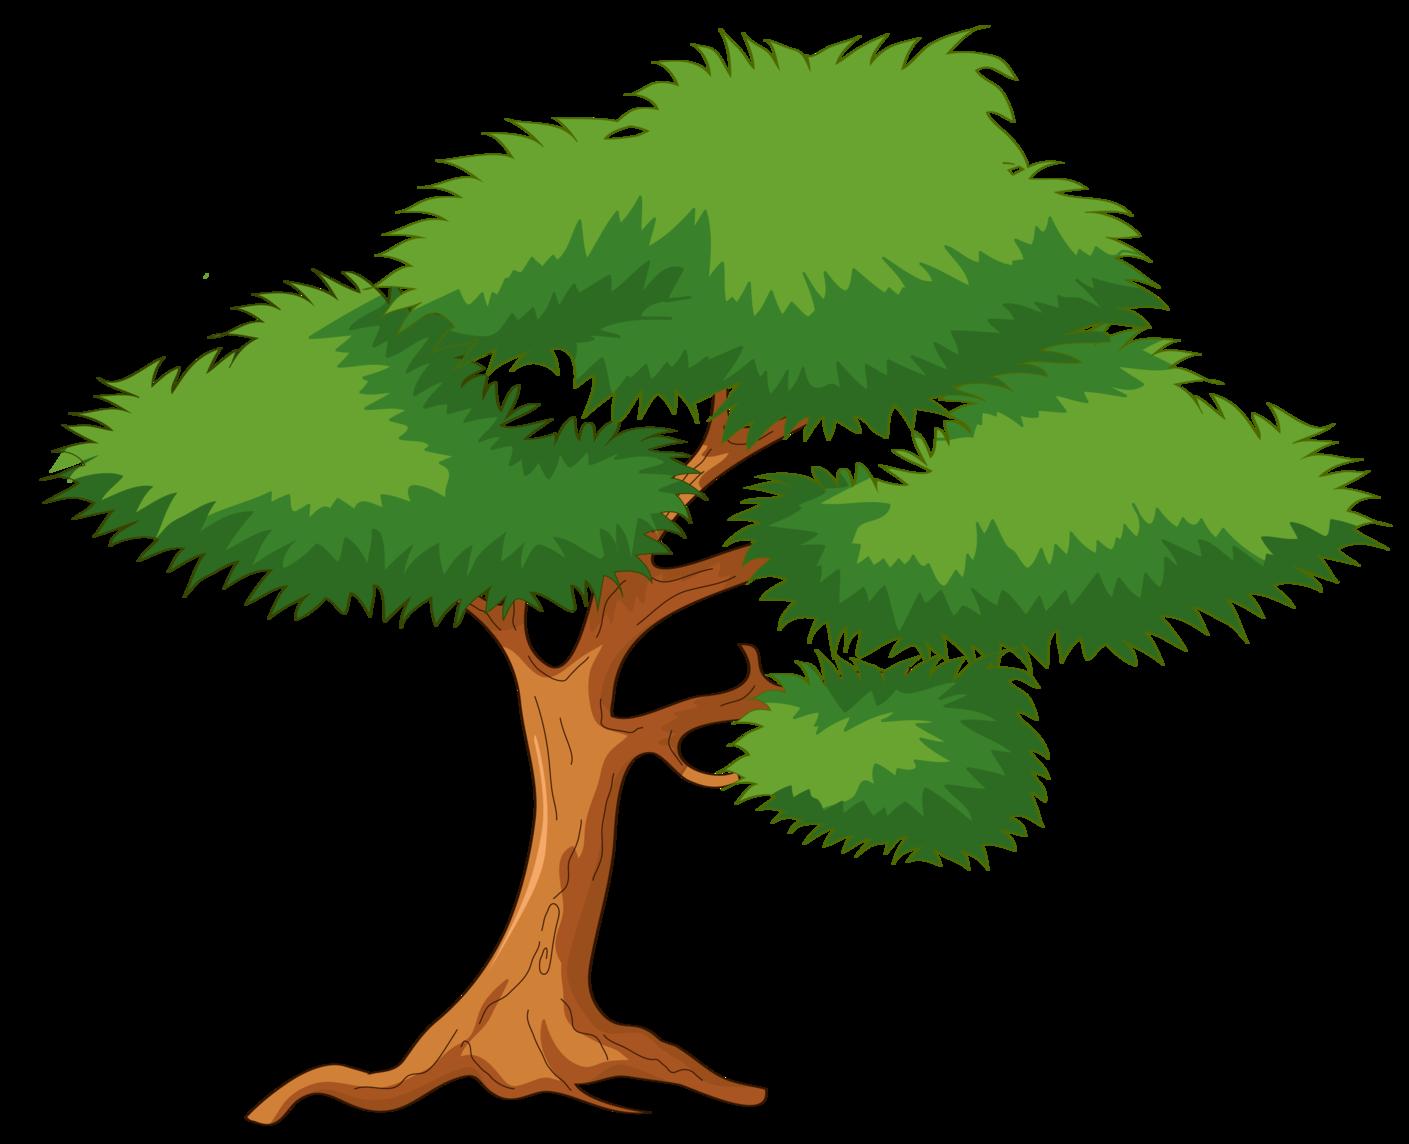 vector freeuse download Green png clip art. Life clipart cartoon tree.